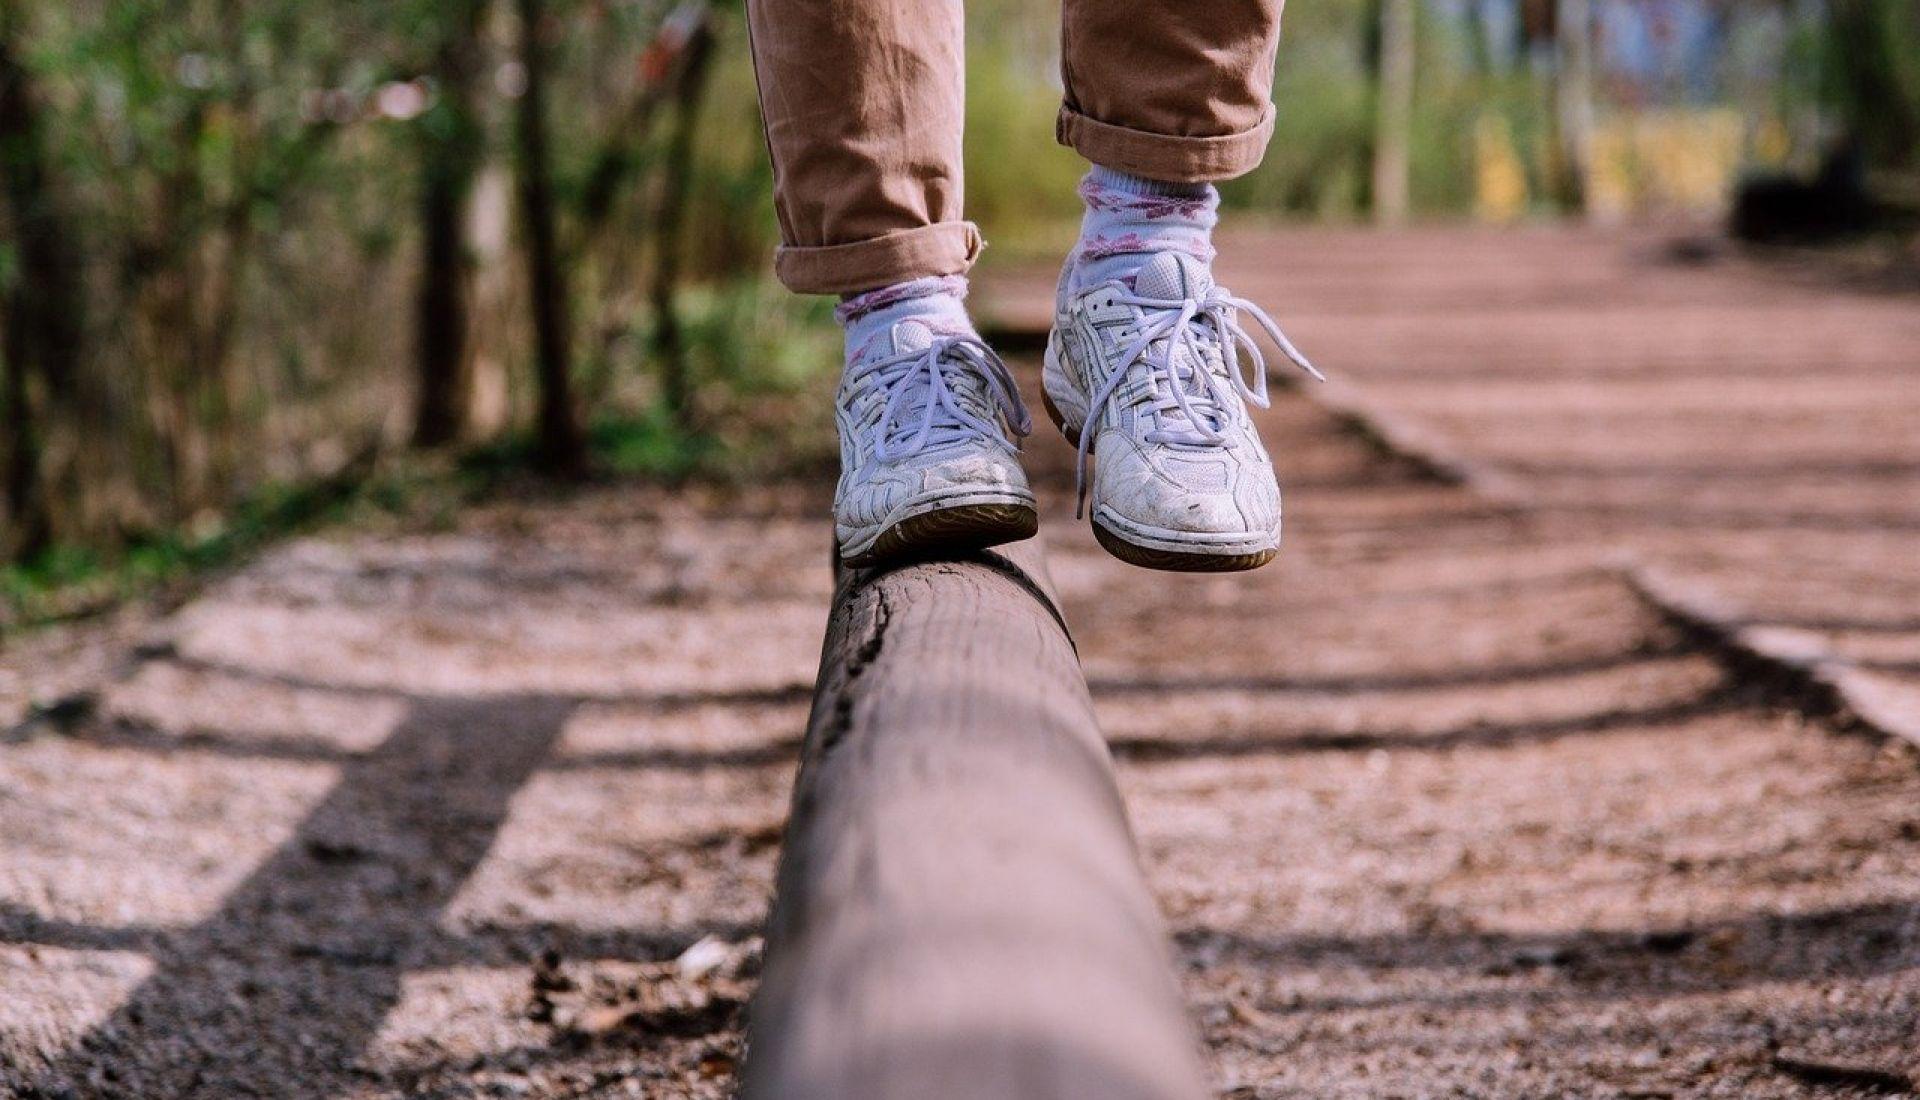 L'équilibre postural